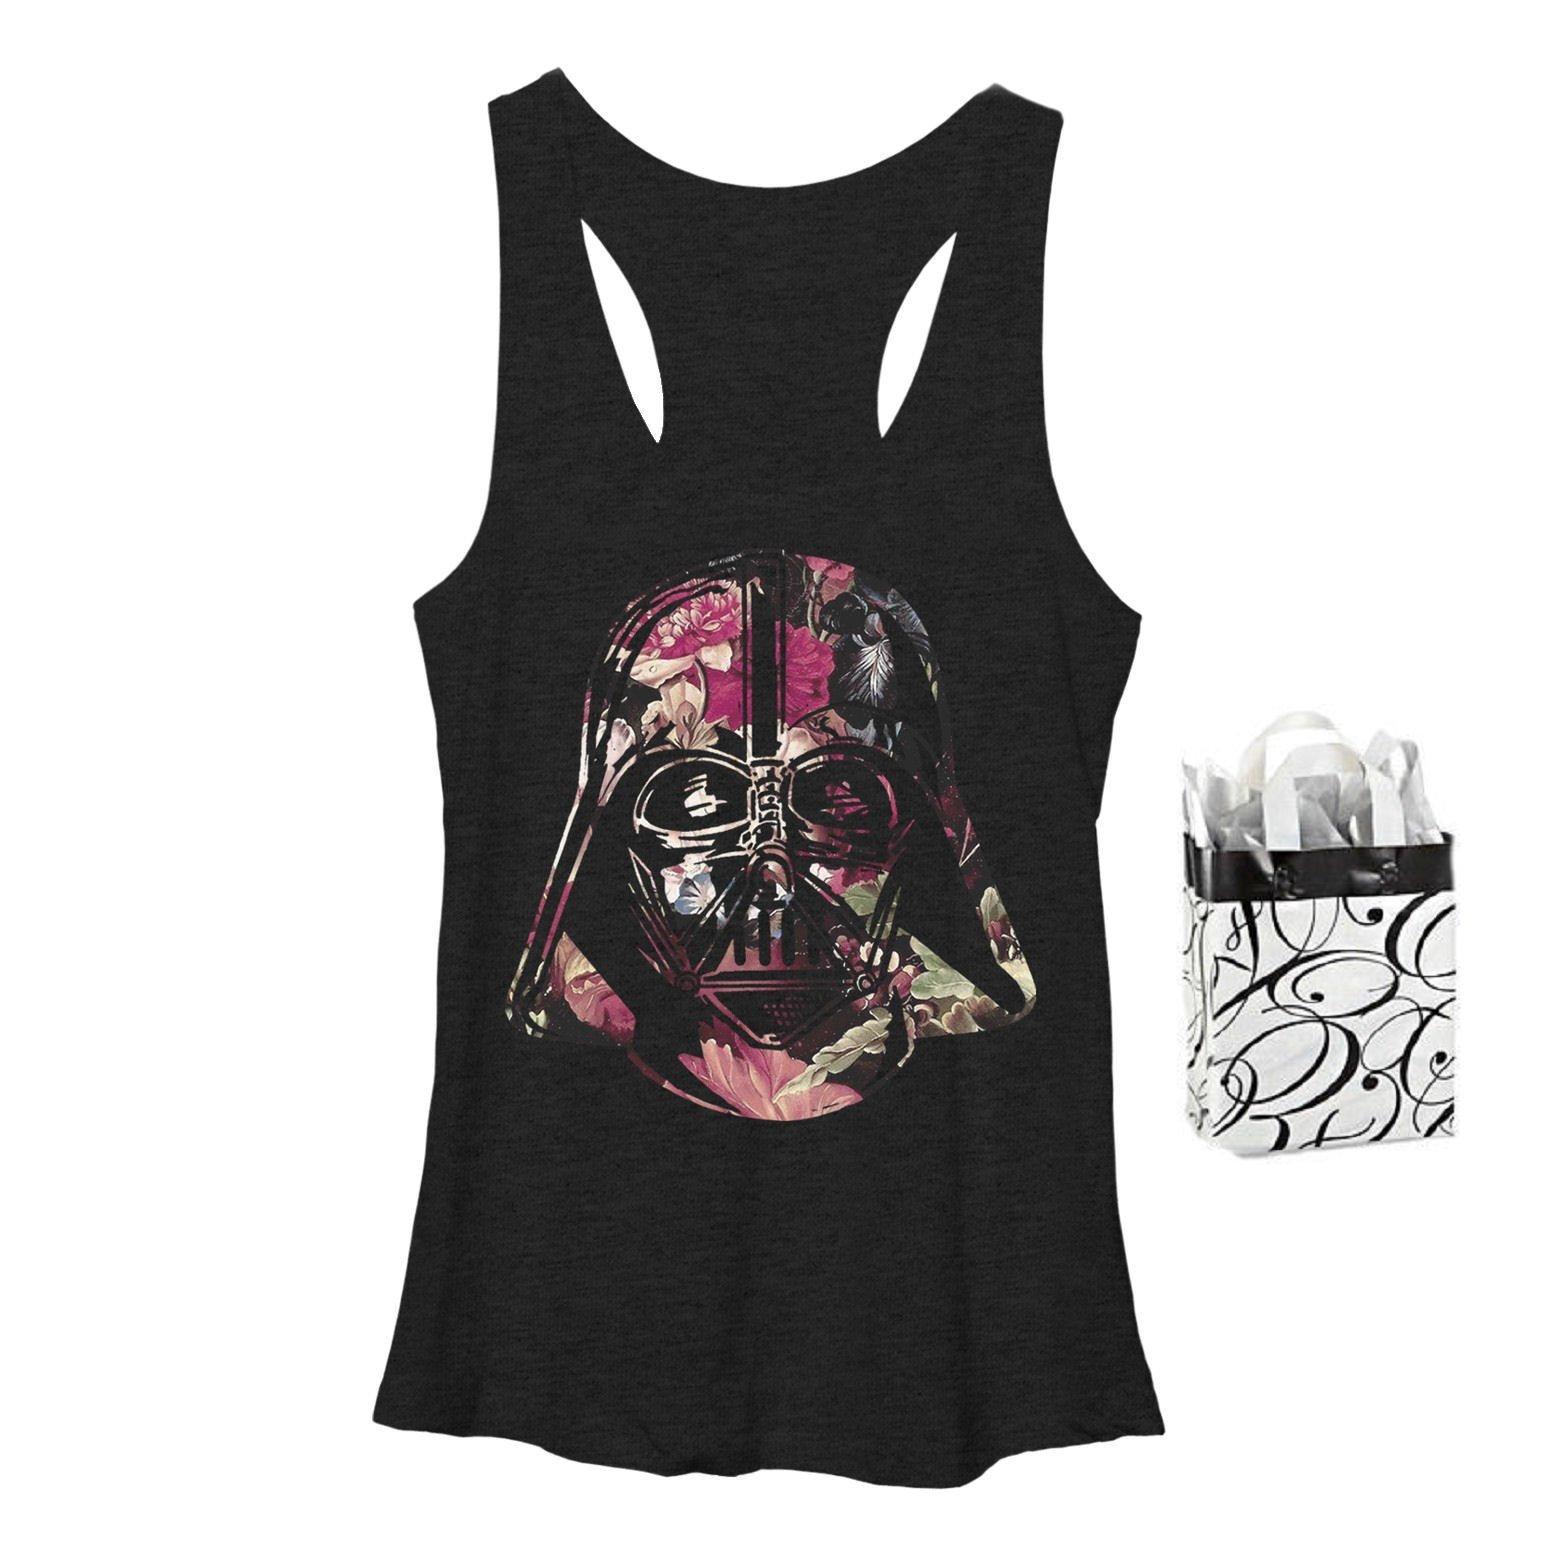 Star Wars Womens' Antique Vader Burnout Tank Top & Gift Bag - Multi-pack (2XL)